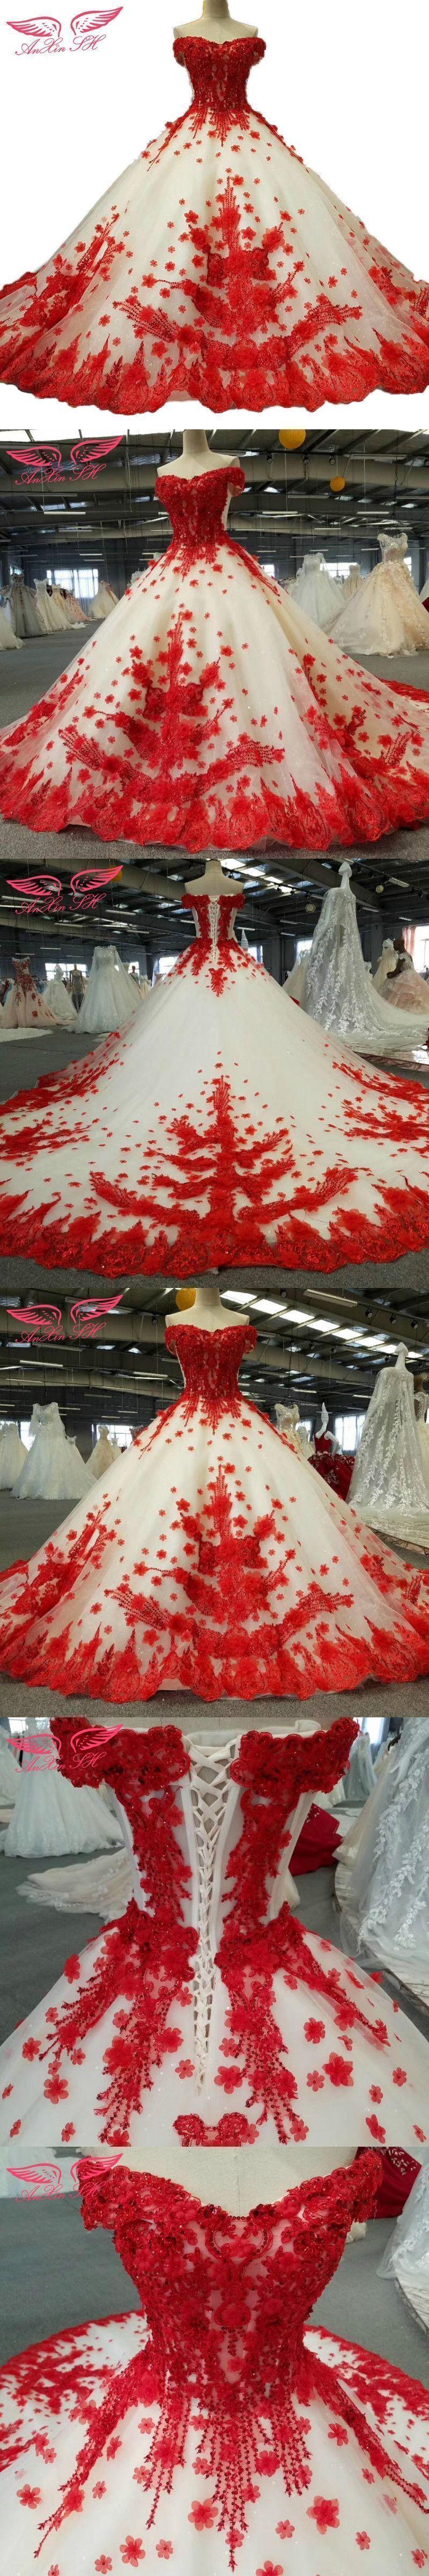 Anxin sh lace red wedding dress princess flower red wedding dress